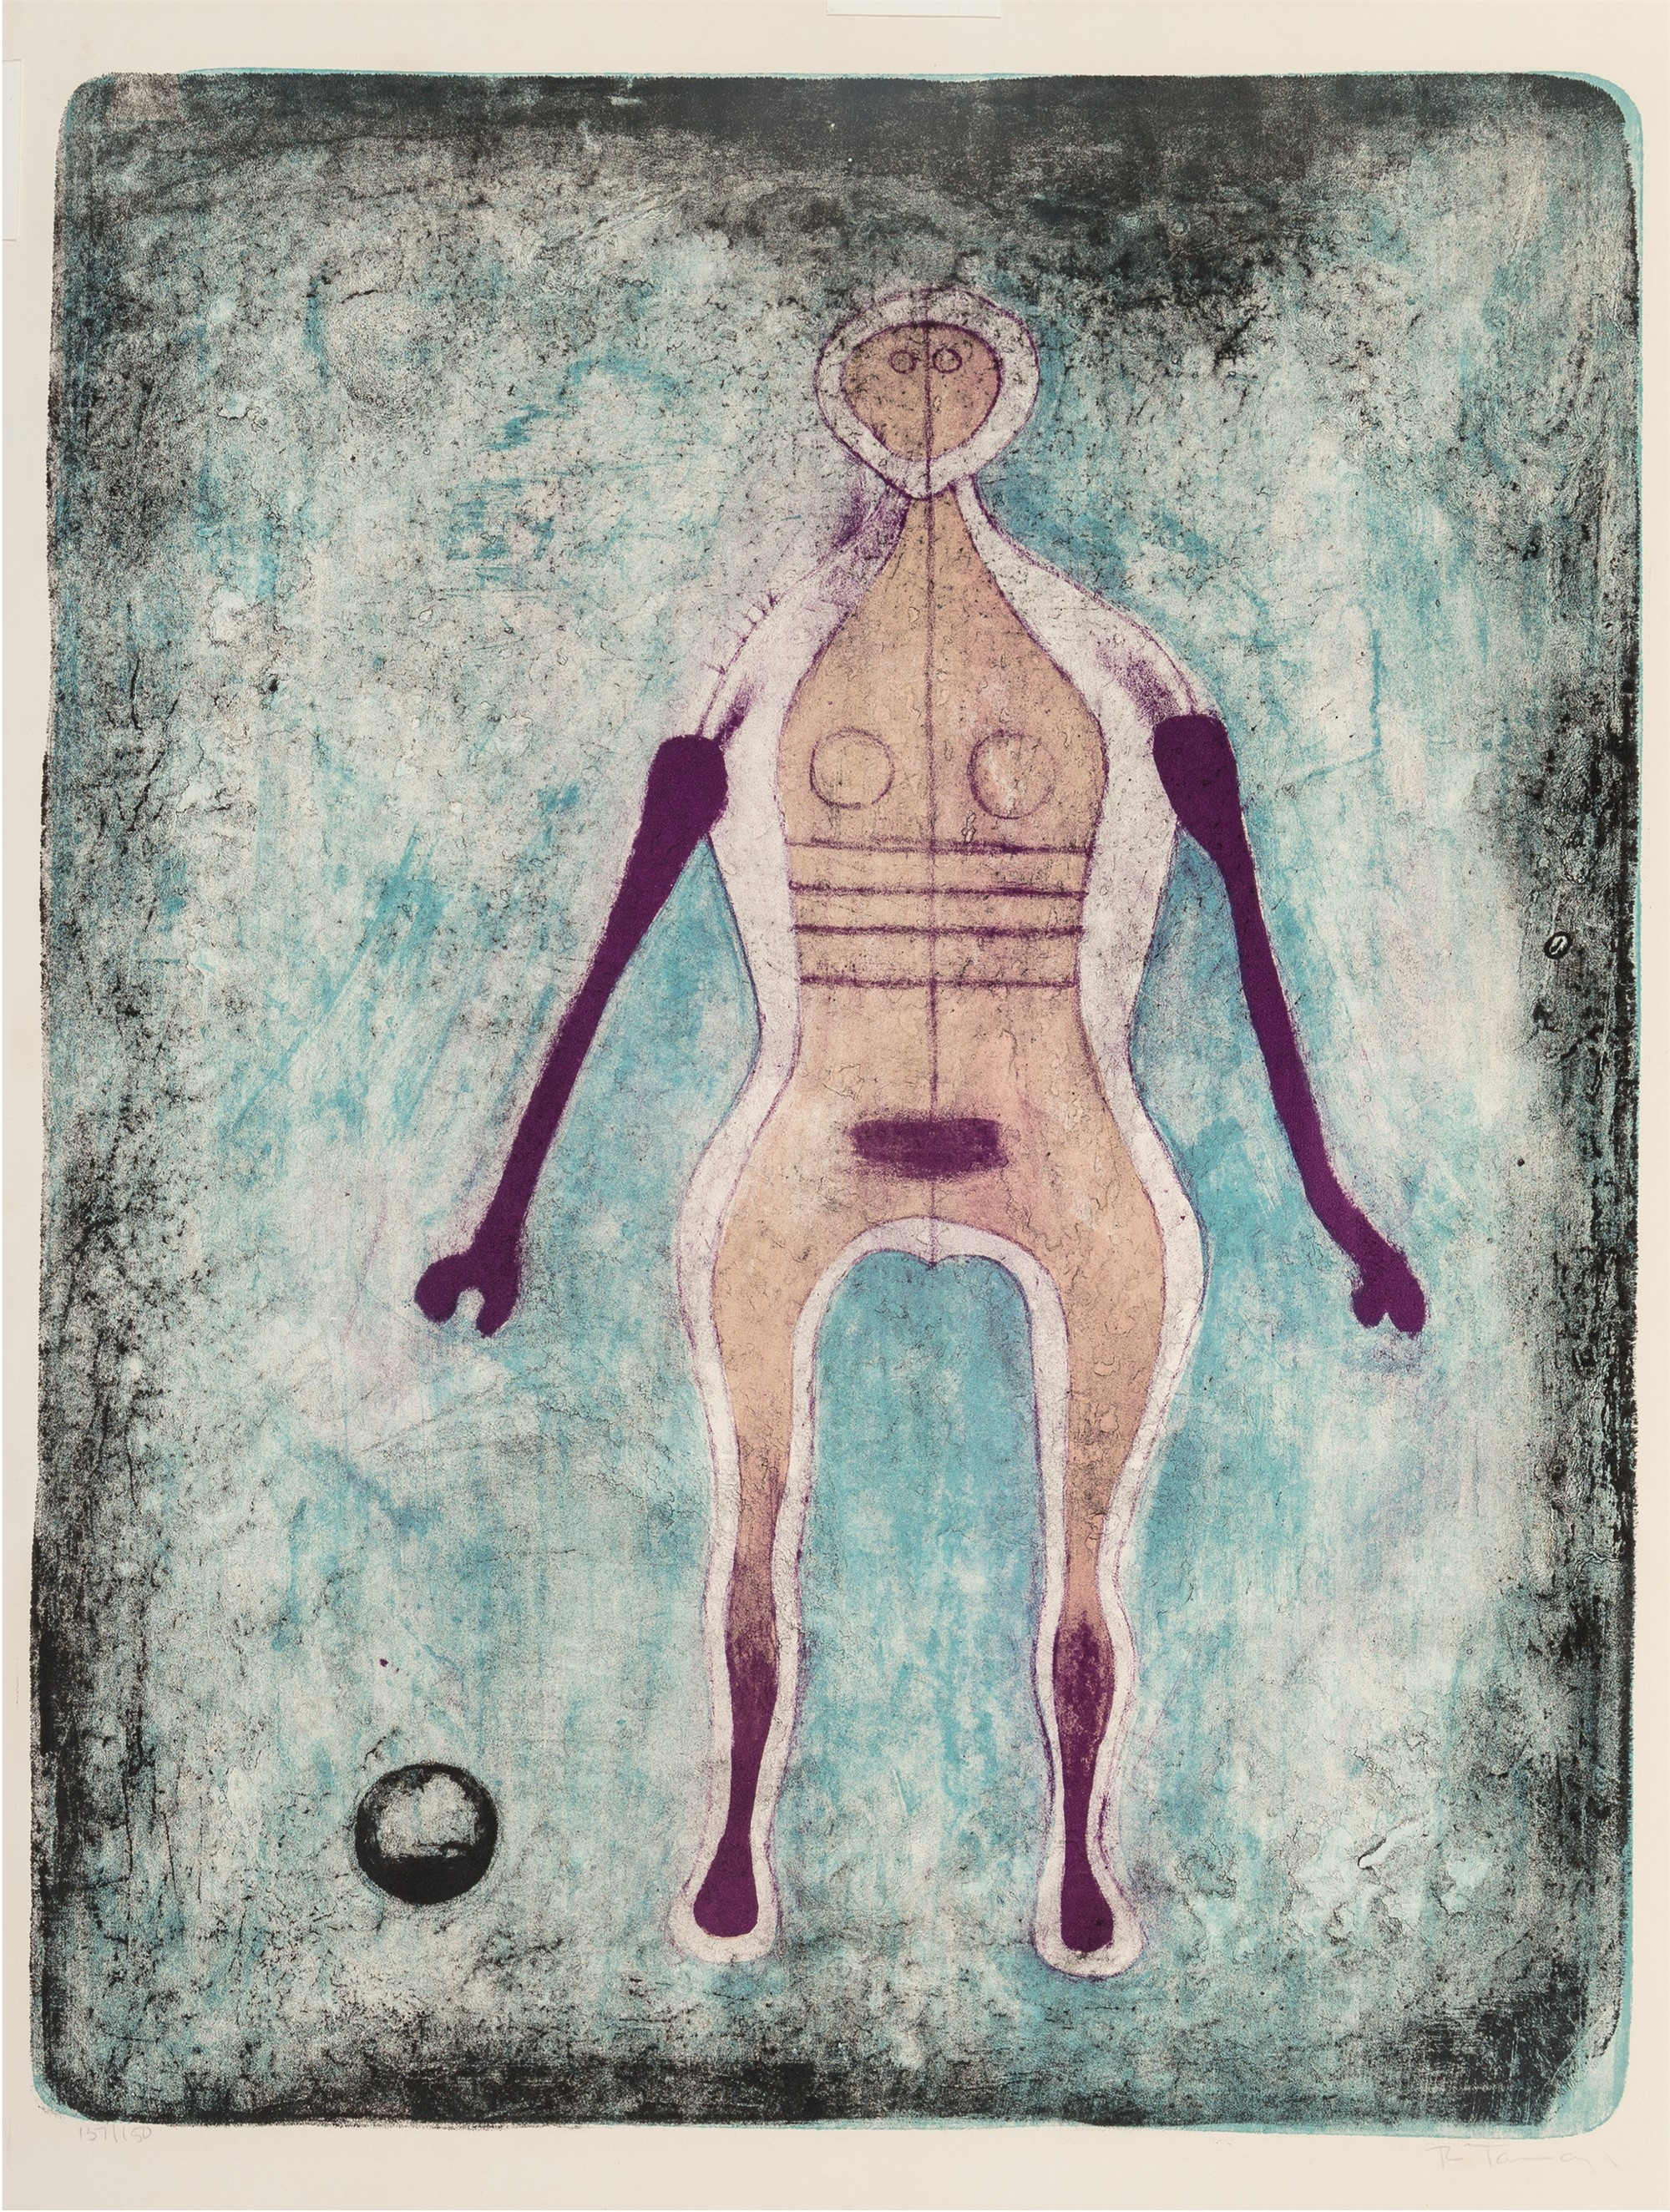 La Négresse by Rufino Tamayo (1899 - 1991)